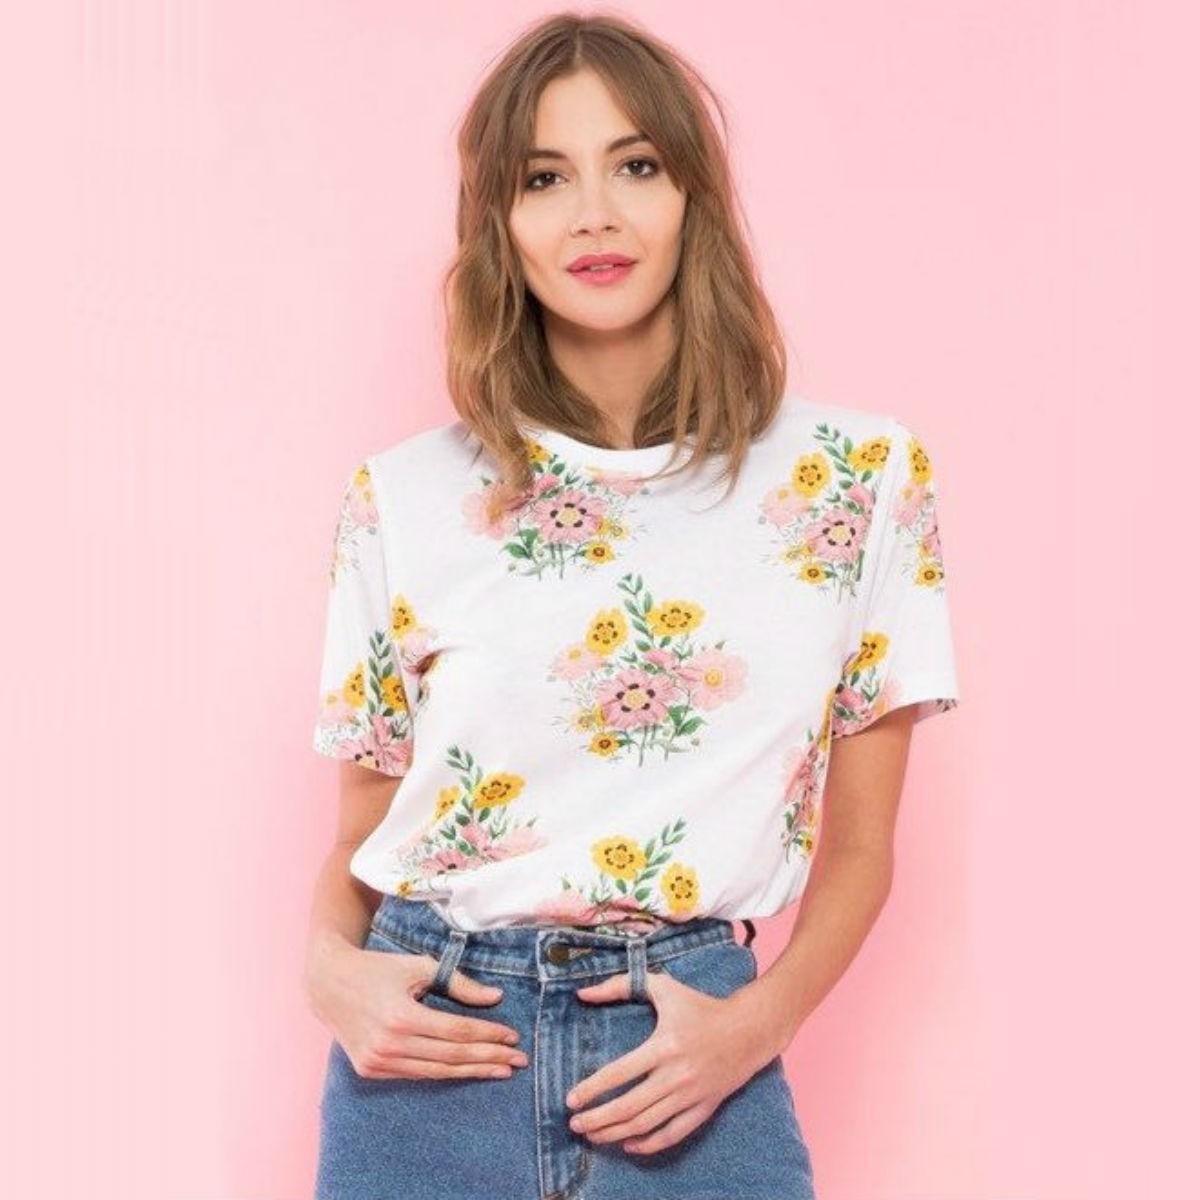 Bílé tričko - Floral Boom - S